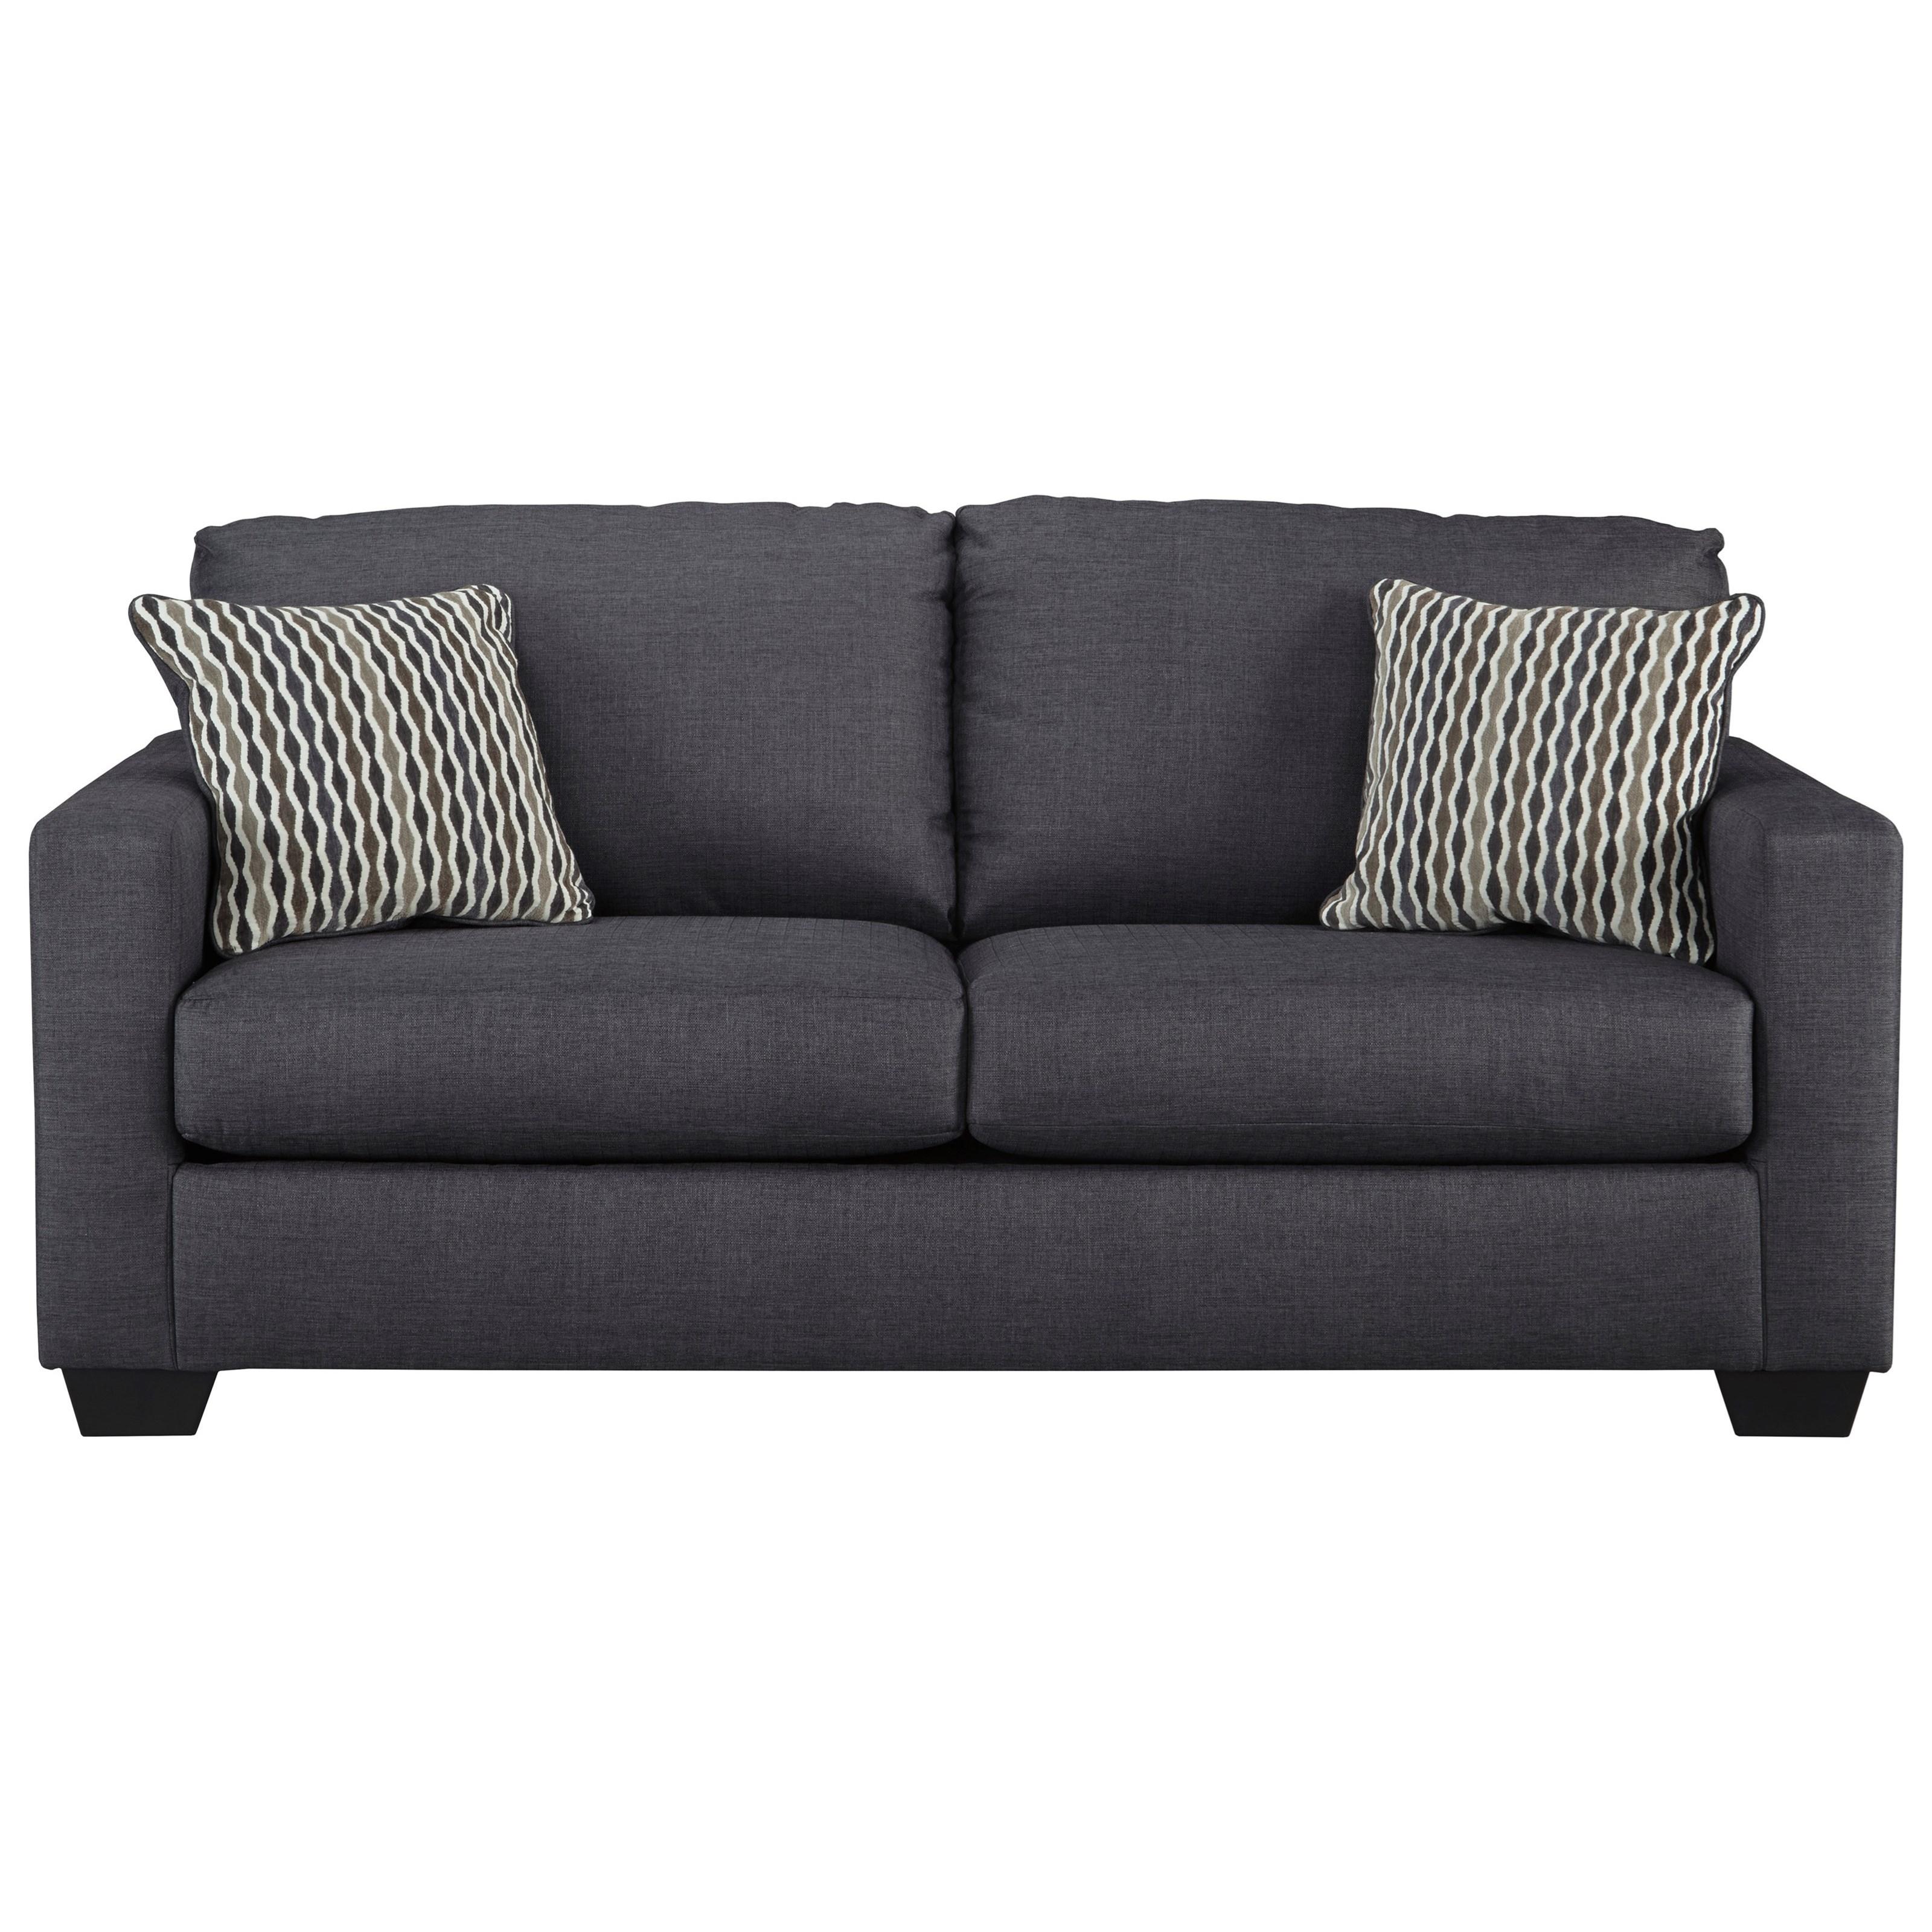 Benchcraft BavelloFull Sofa Sleeper ...